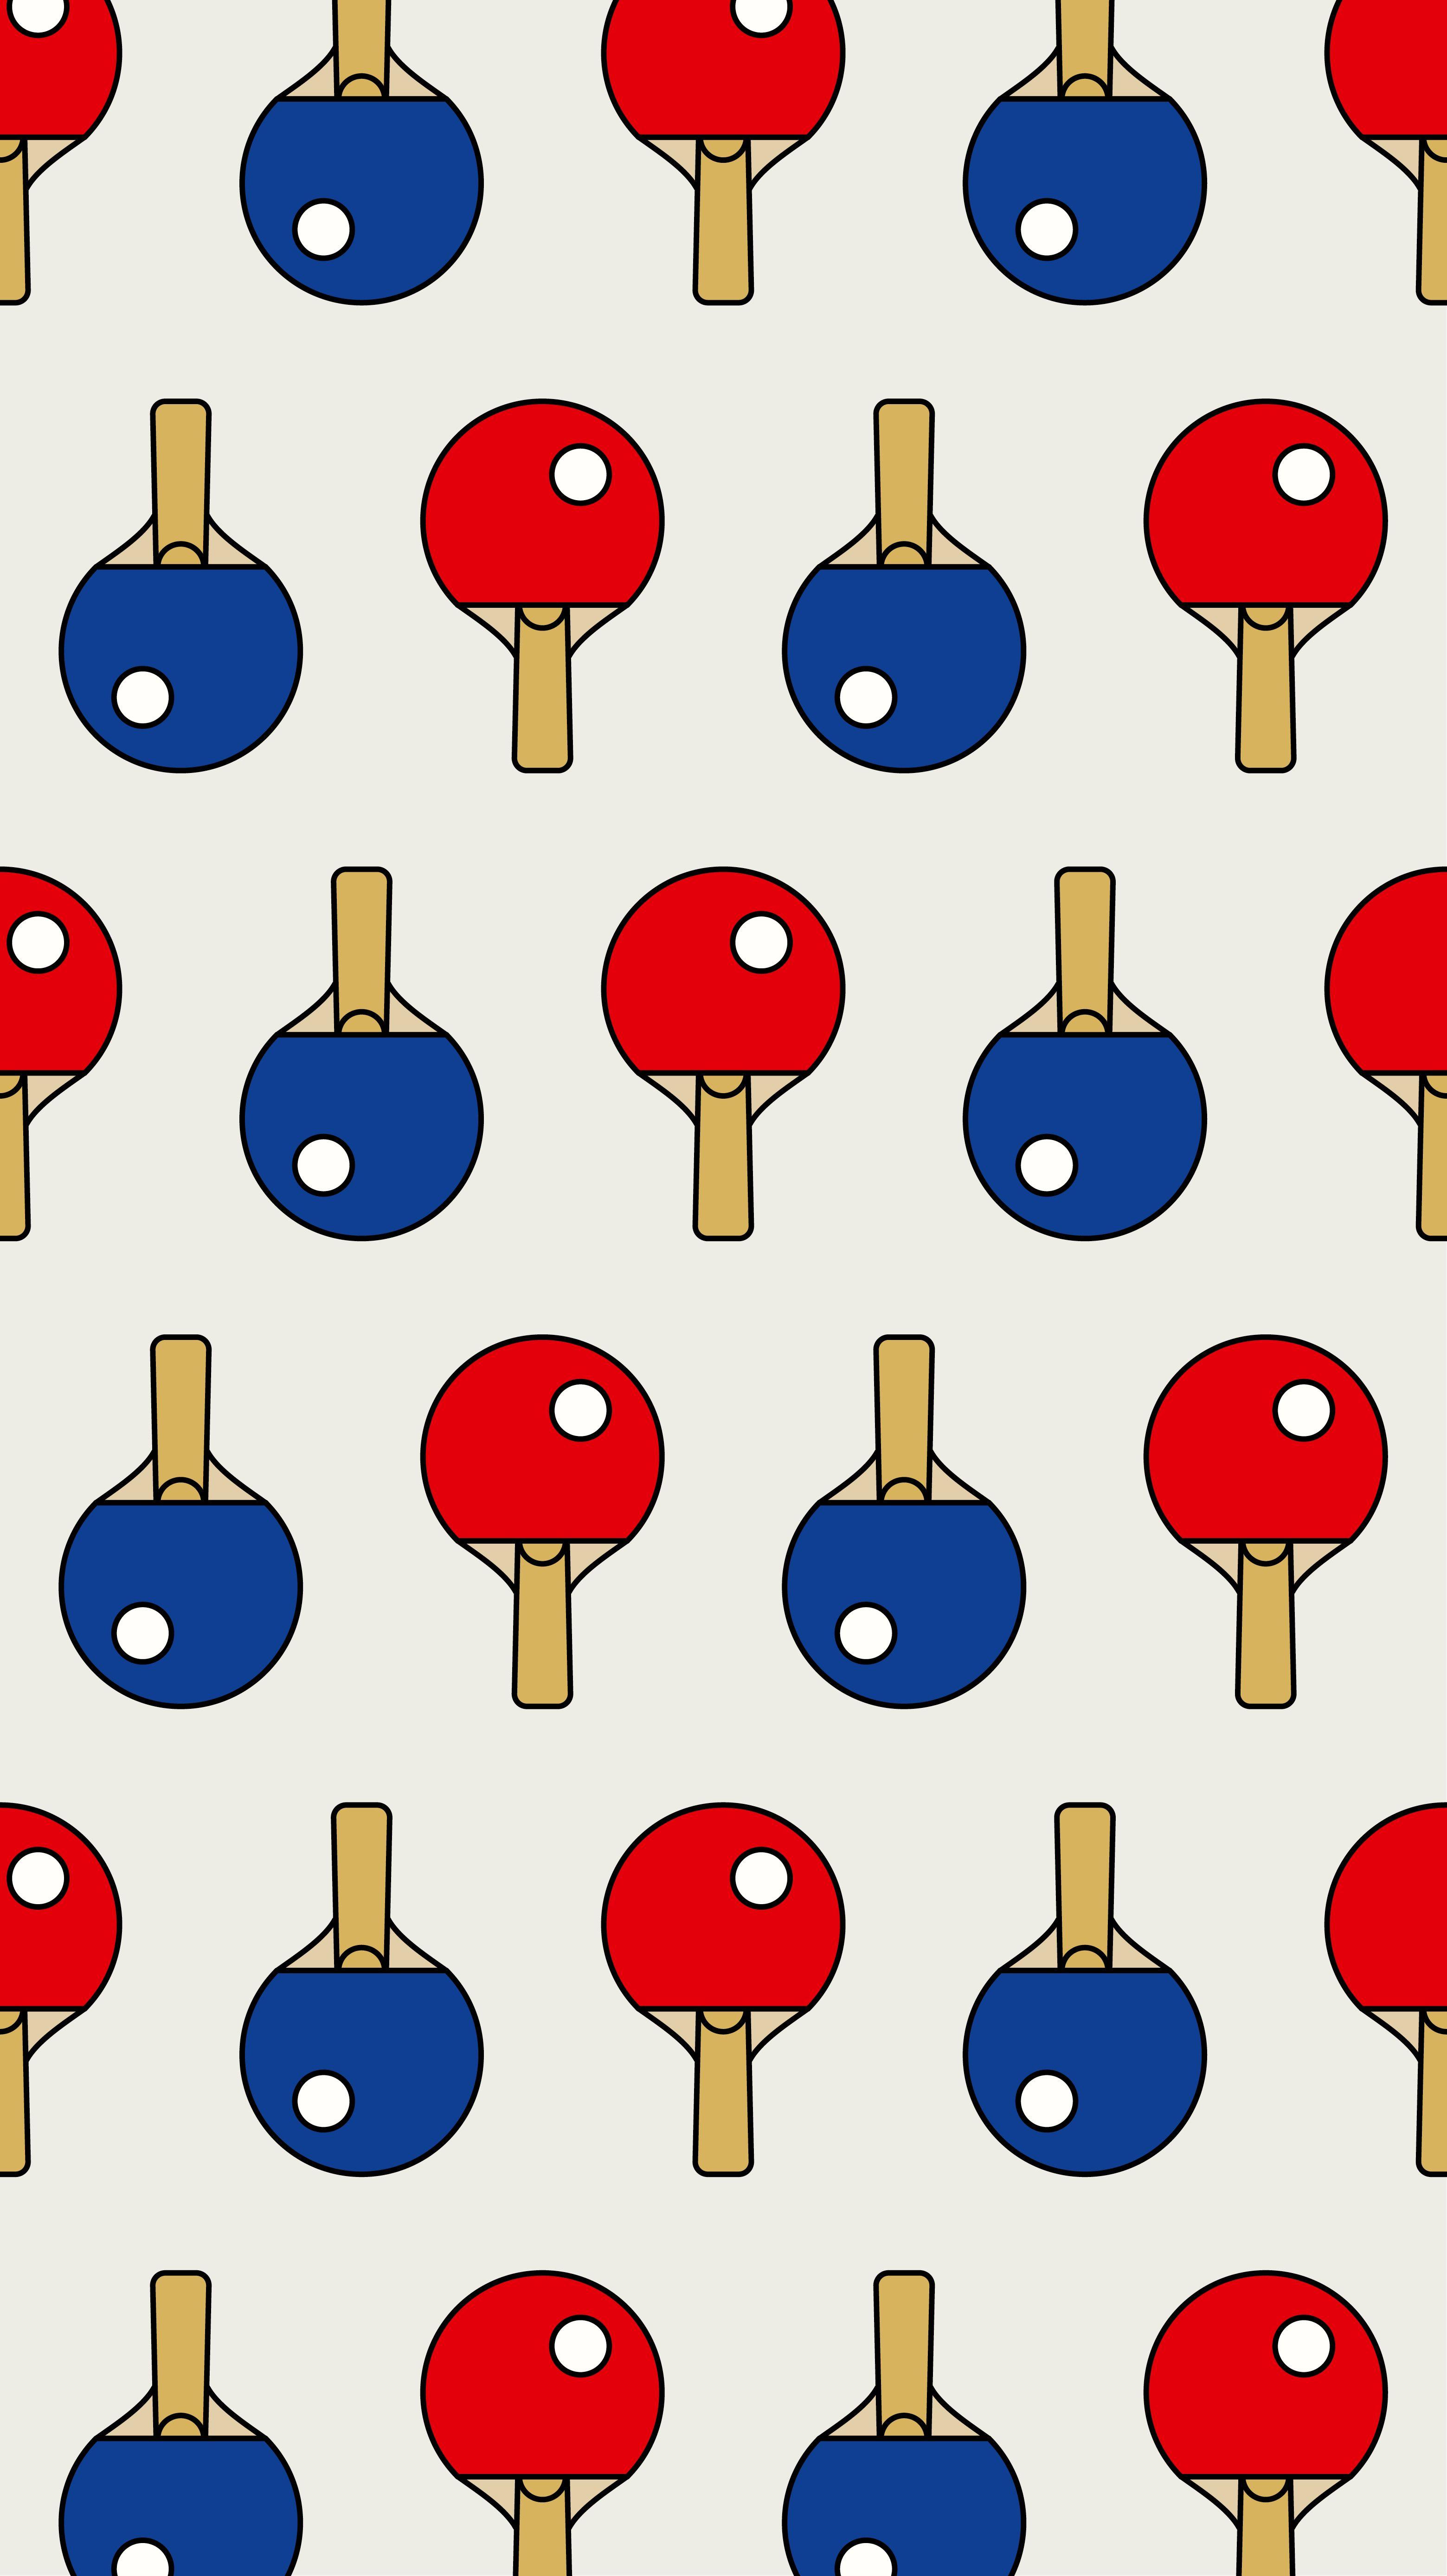 Ping Pong Wallpaper Smartphone Tennis Wallpaper Ping Pong Table Tennis